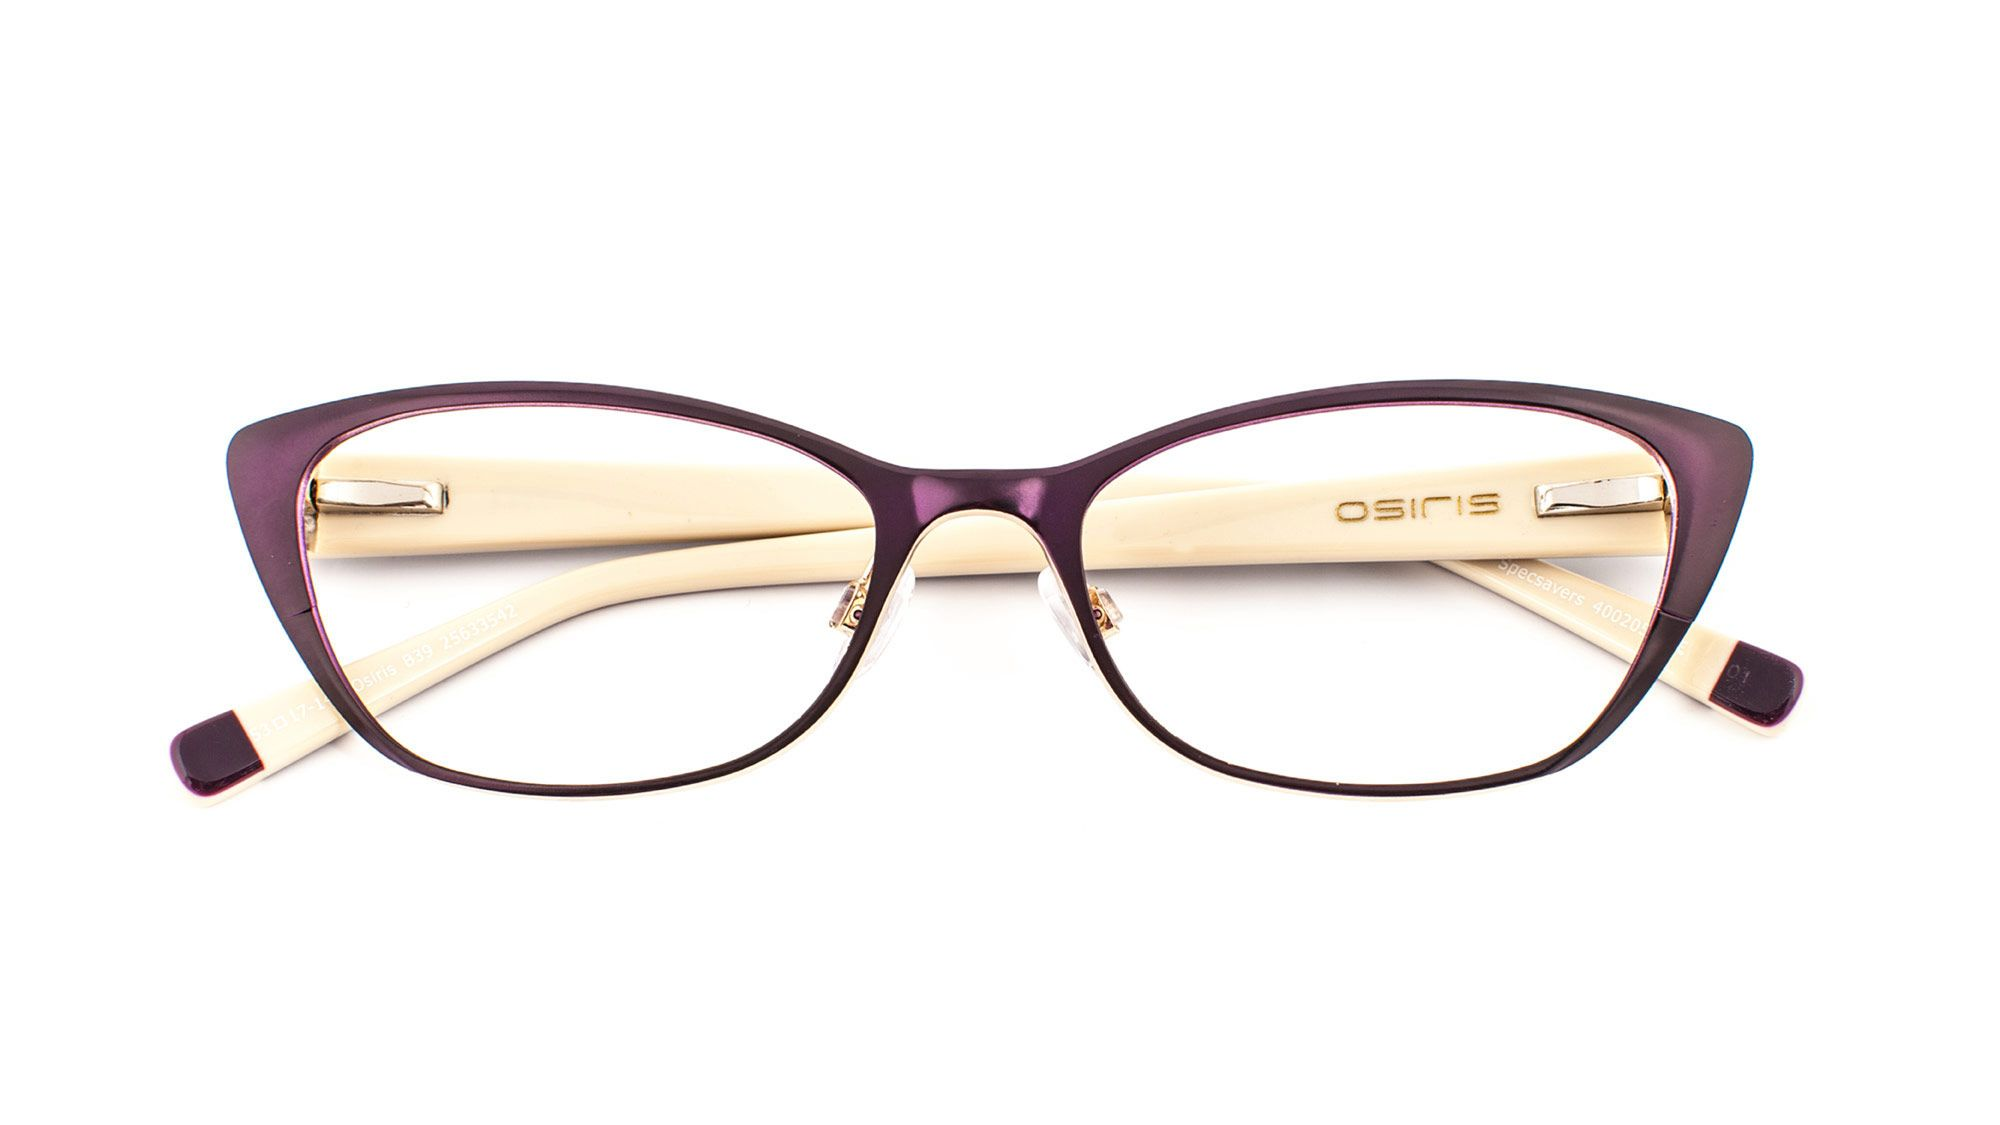 82f4492578f9 OSIRIS B39 Glasses by Osiris | Specsavers UK | Eyeglasses | Glasses ...